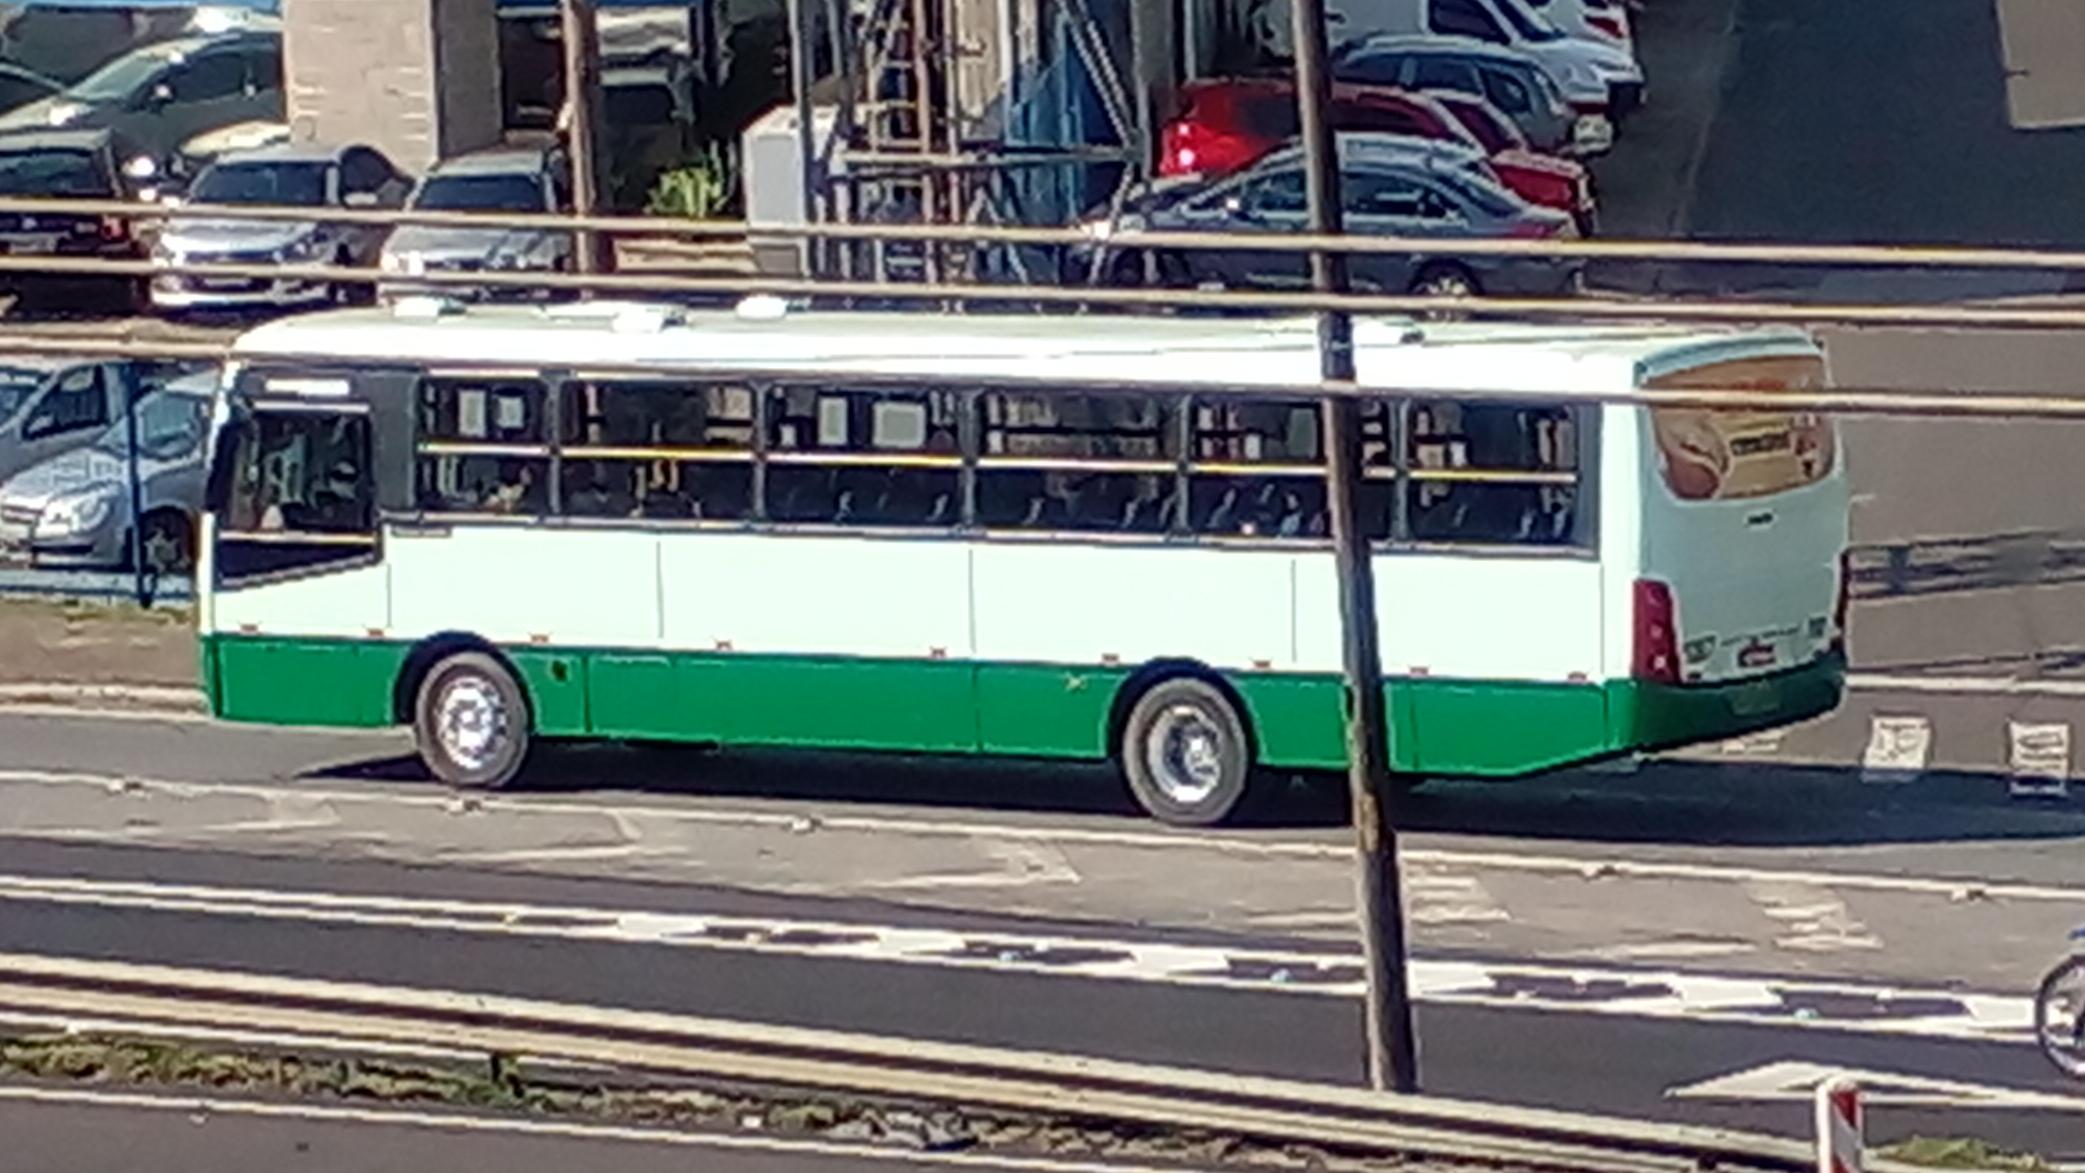 JOTUR-Auto-nibus-e-Turismo-Josefense-SC-1267.jpg